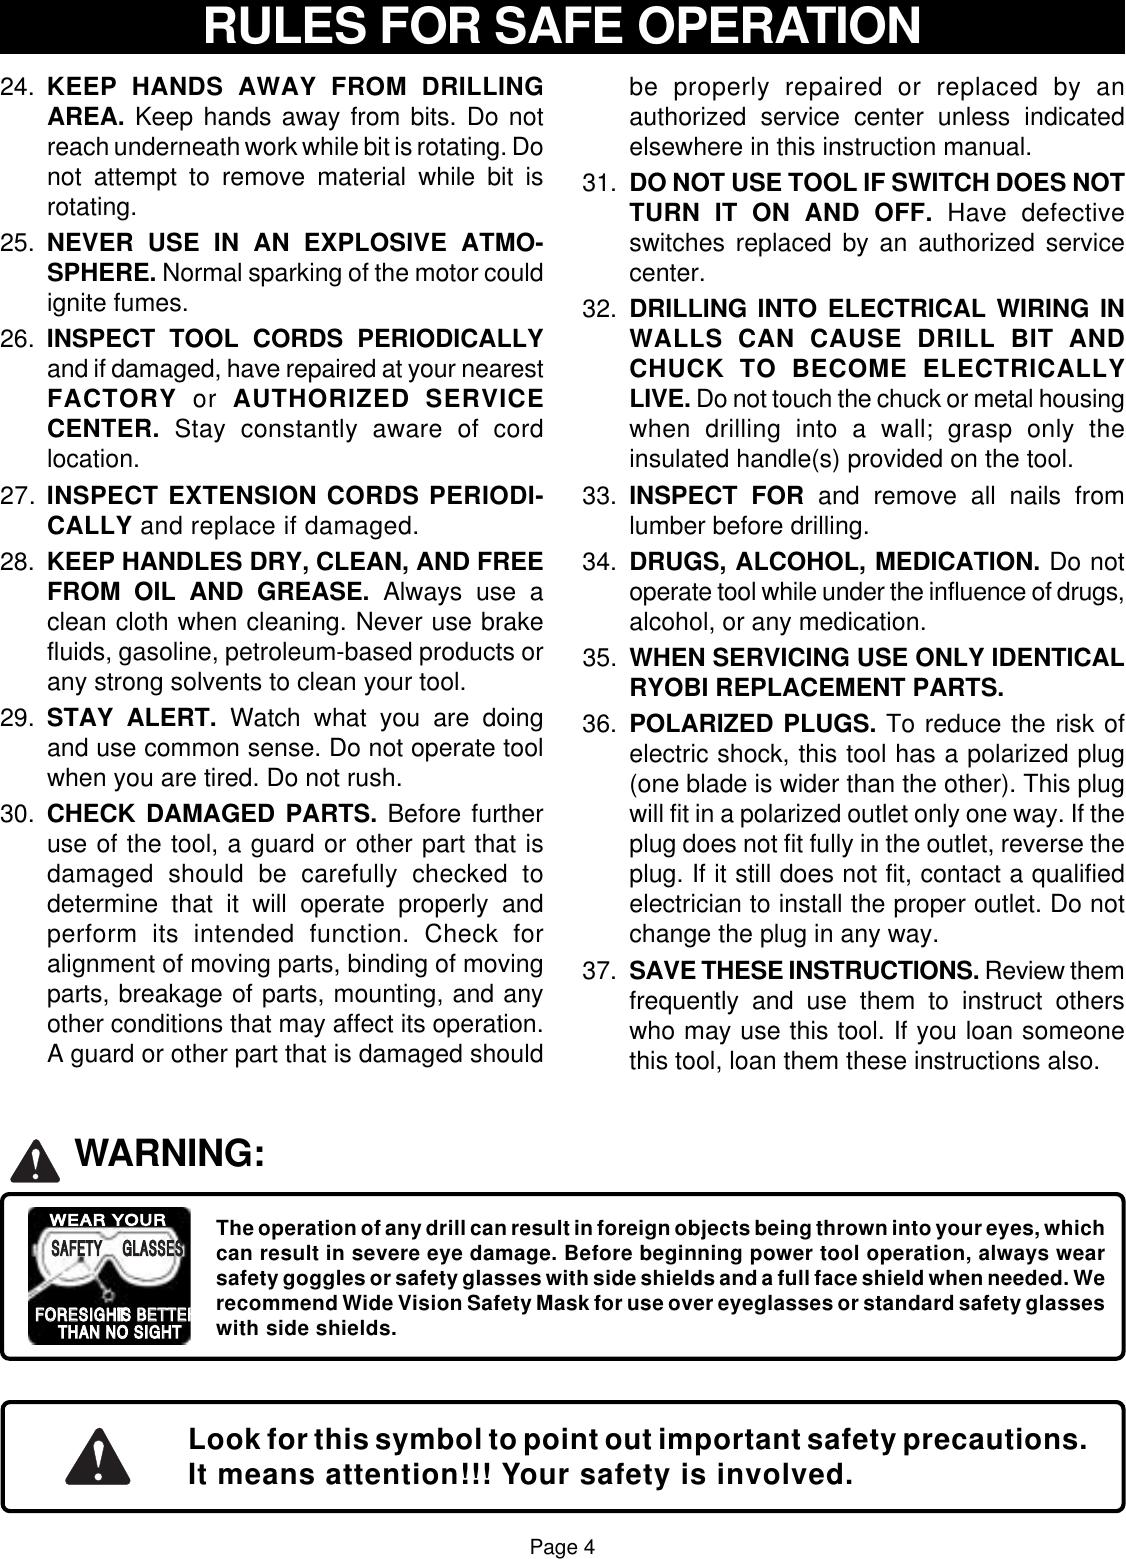 Ryobi D130Vr Owner S Manual D130VR_398_eng